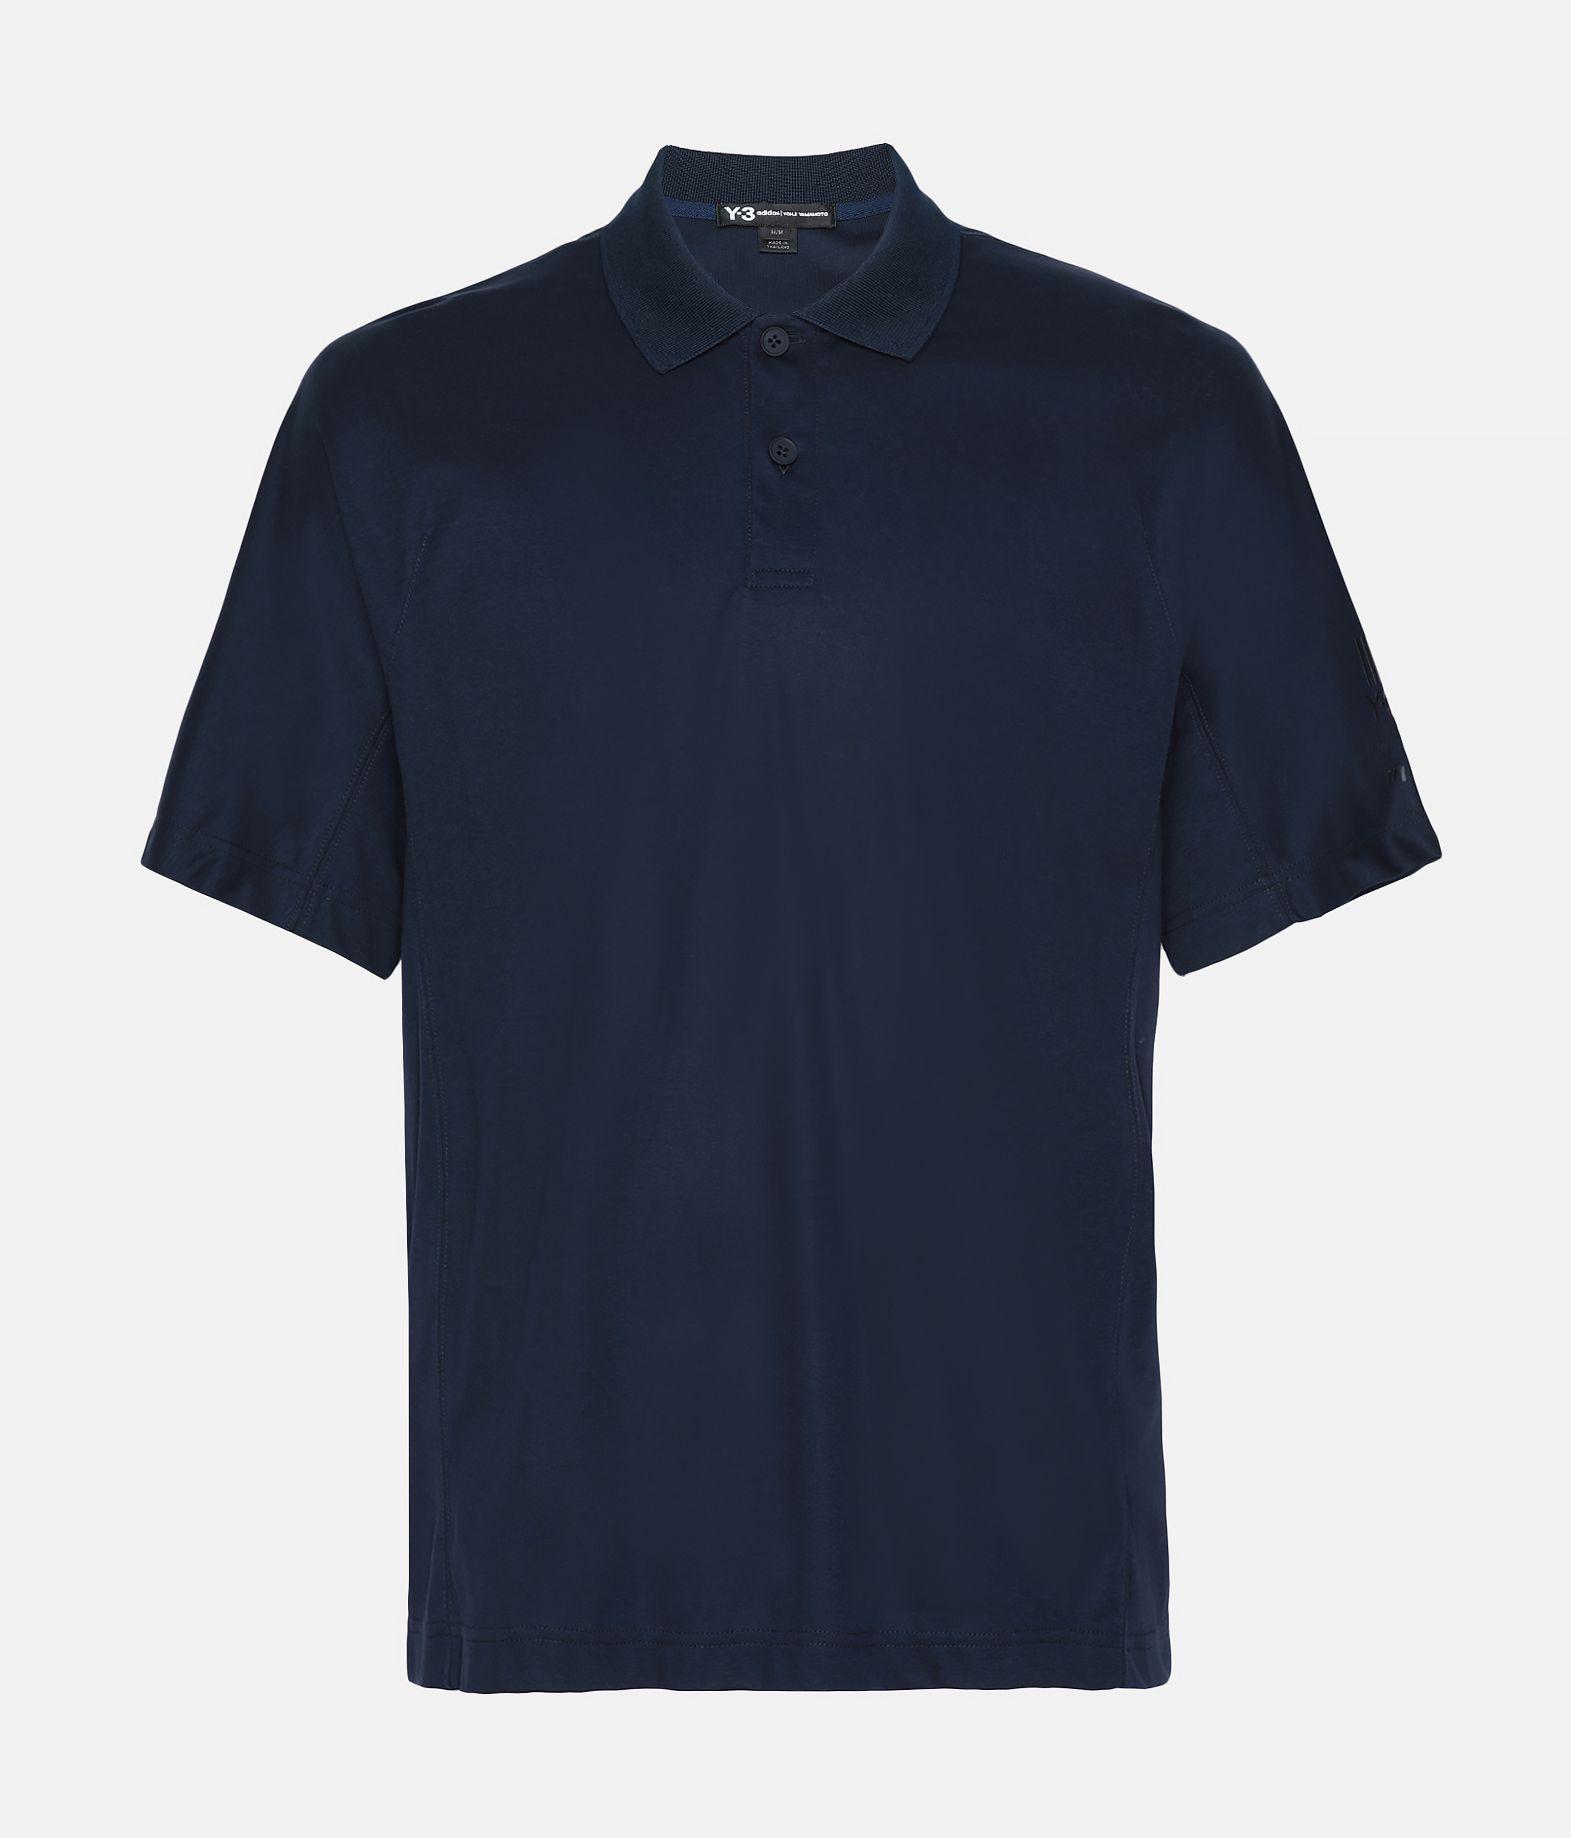 Y-3 Y-3 Classic Polo Shirt Polo Man f